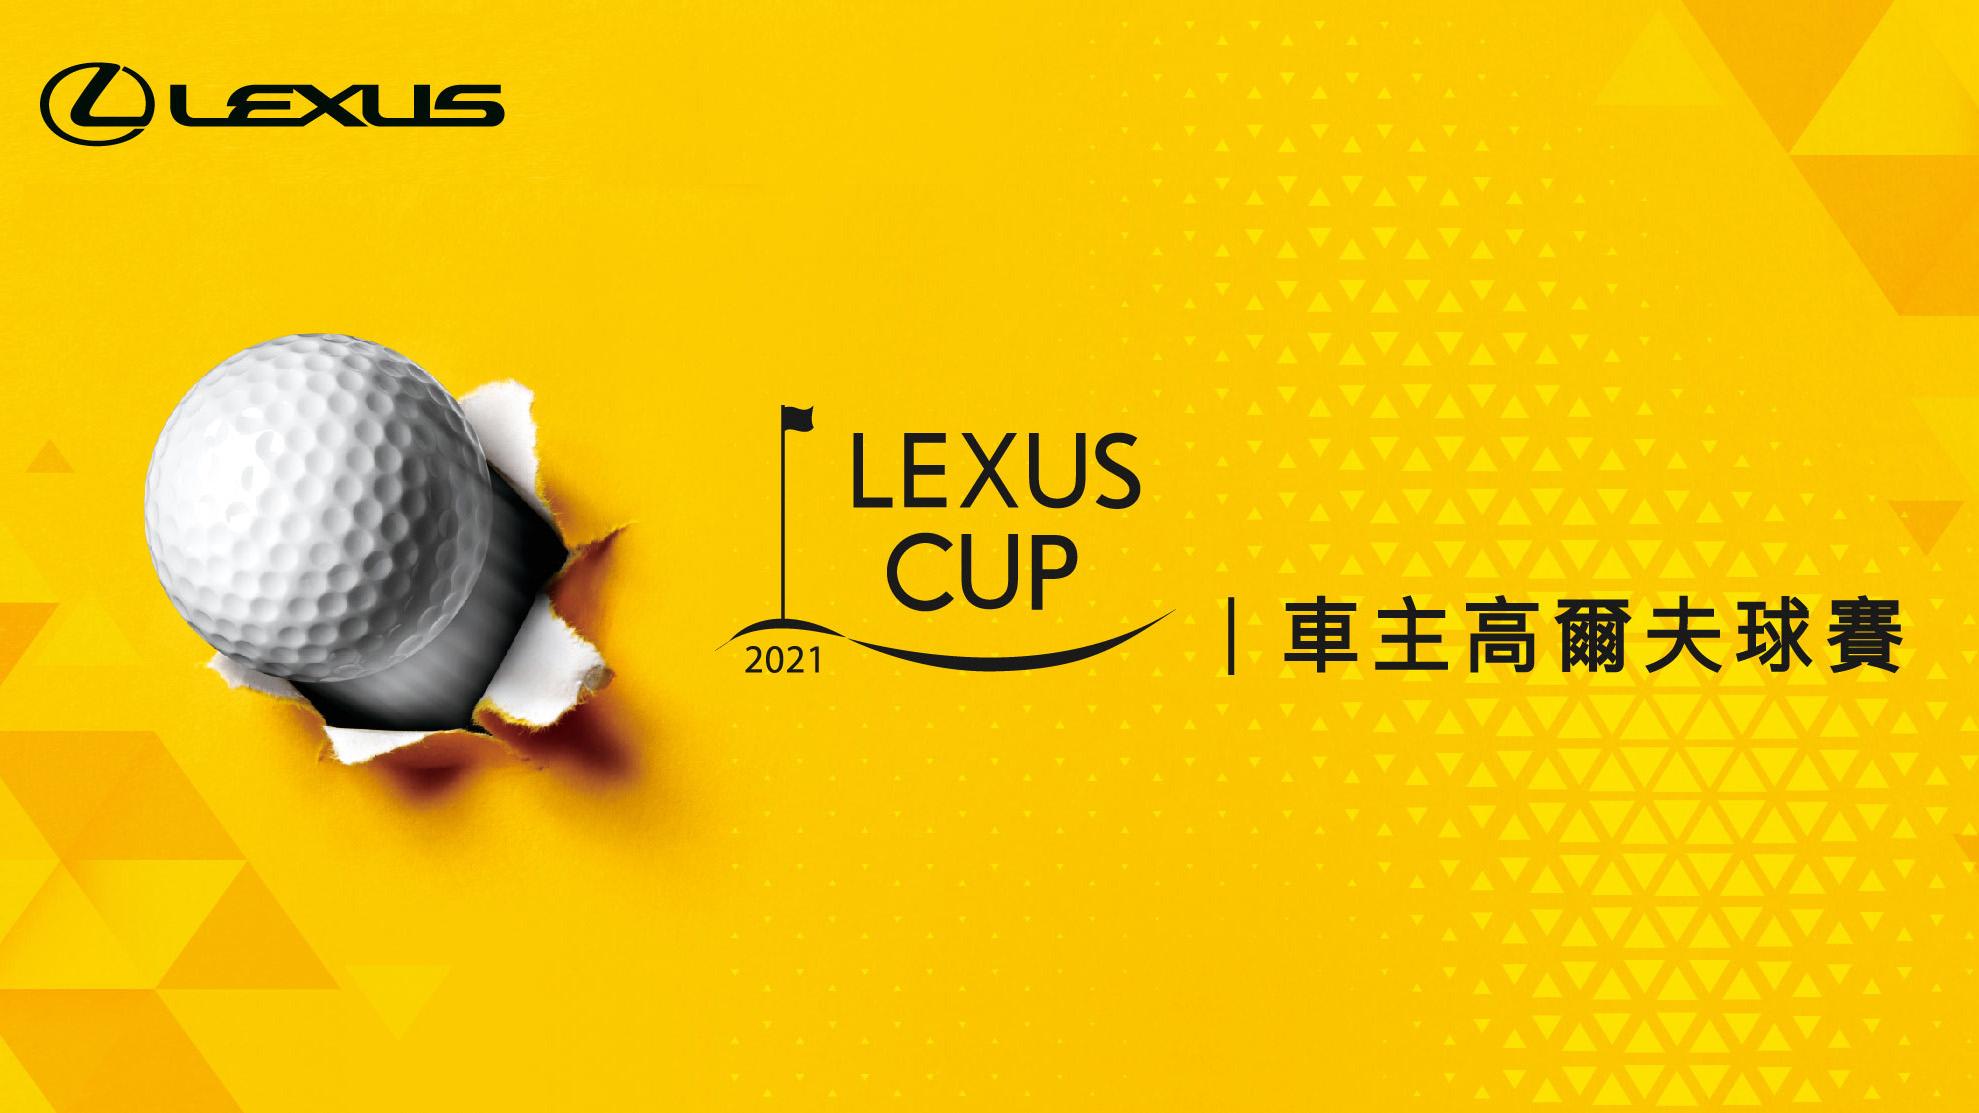 2021 Lexus Cup 高爾夫球賽報名展開,一竿進洞就送 UX!